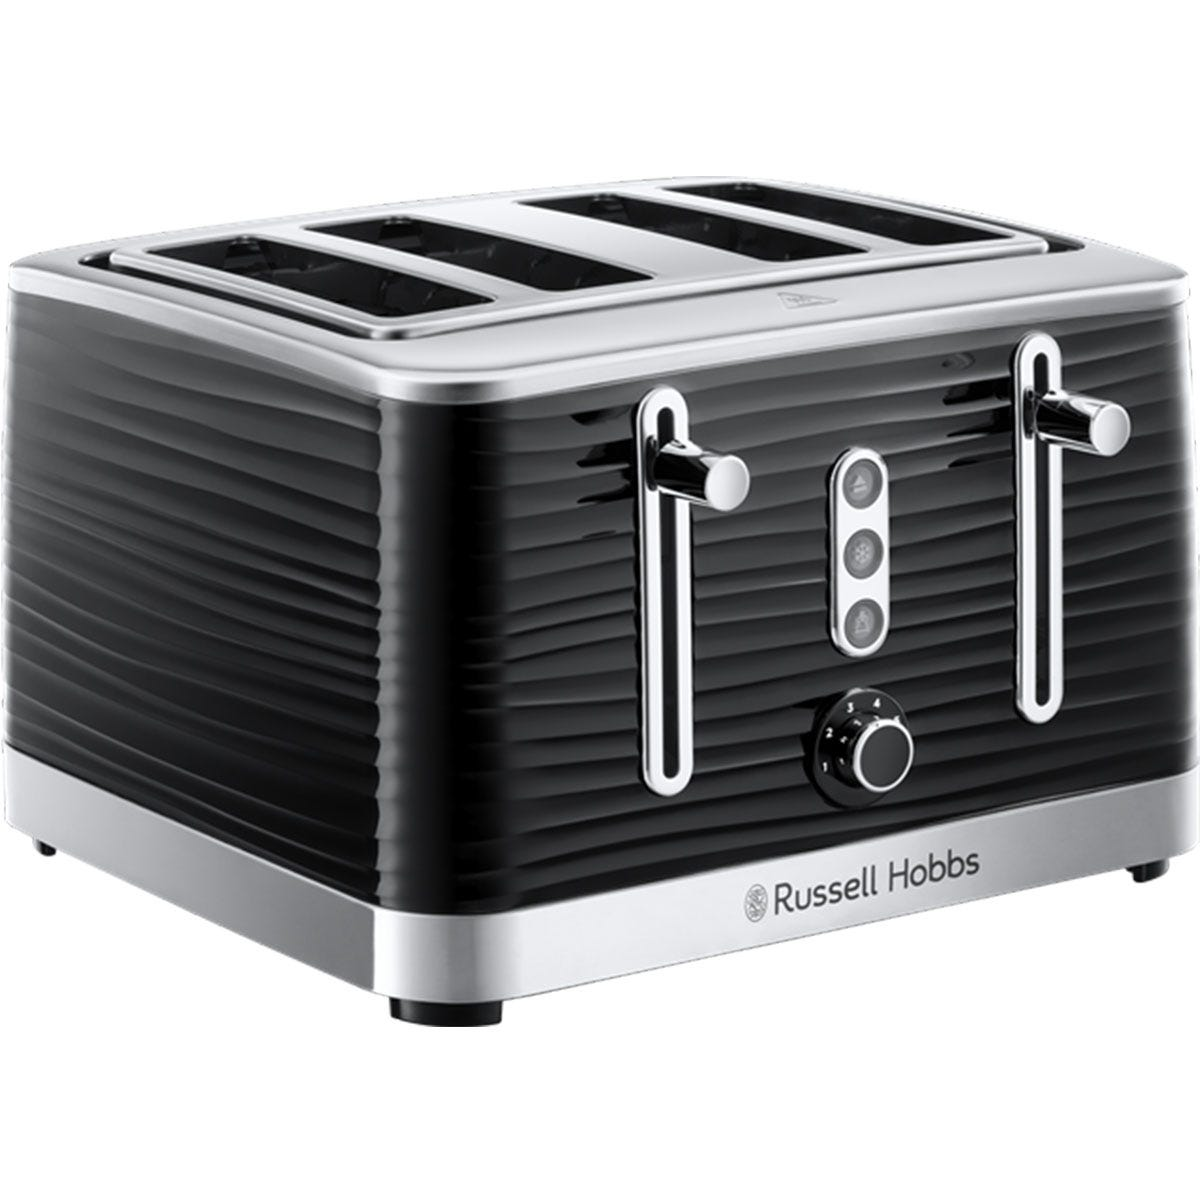 Russell Hobbs 24381 Inspire 1800W 4 Slot Toaster - Black